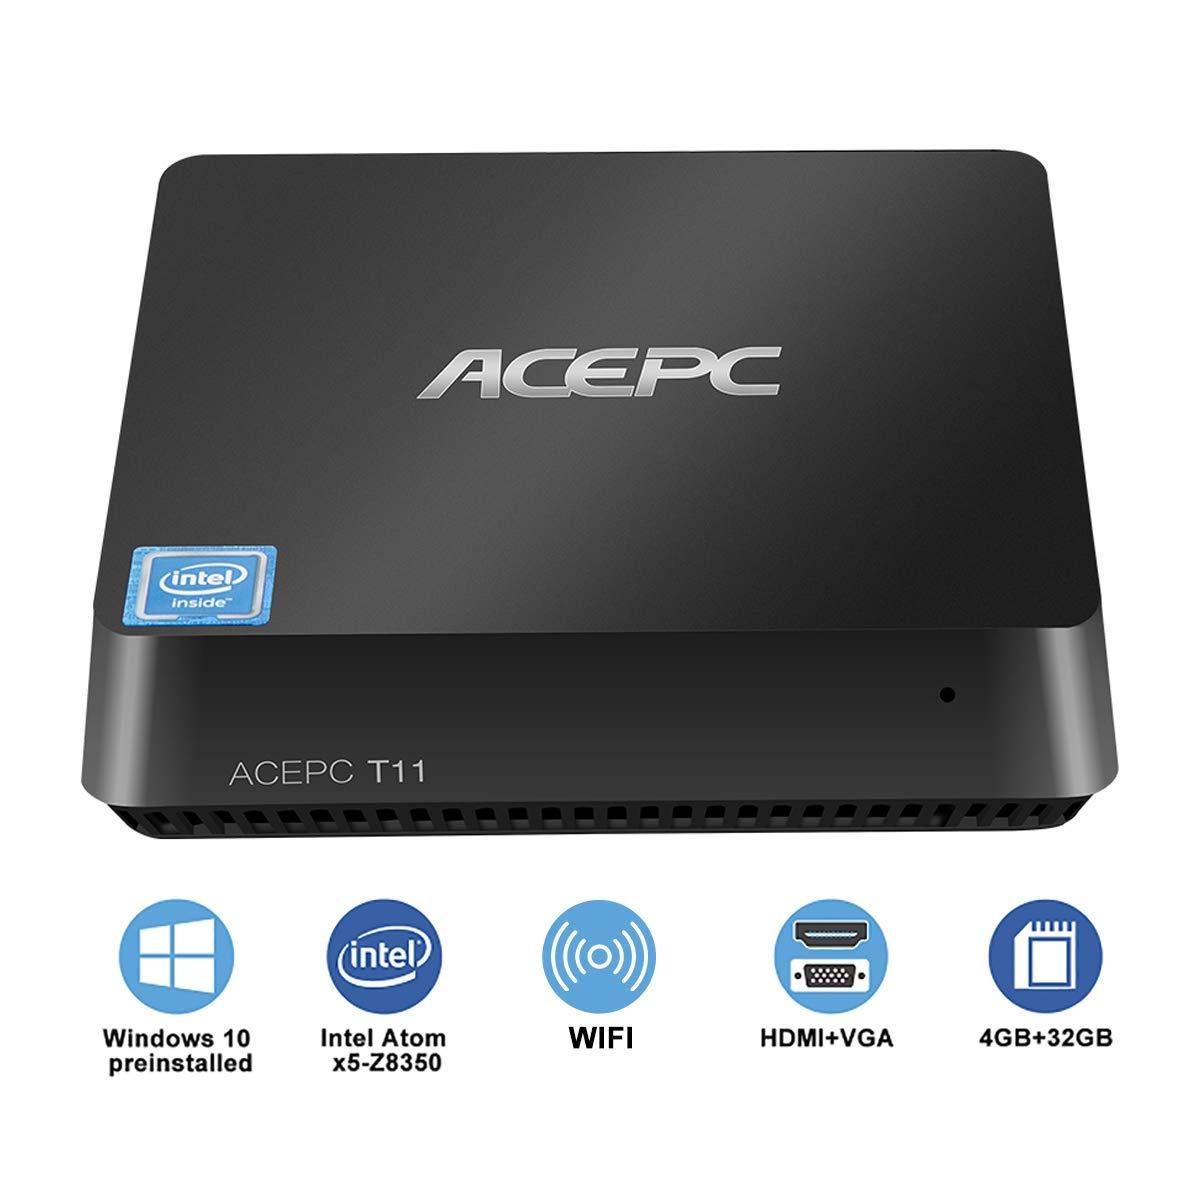 TALLA T11/4GB+32GB/Windows 10 Pro. Mini PC Windows 10 Pro Procesador Intel Atom x5-Z8350 4GB Ram 32GB EMMC Soporte SATA SSD de 2,5 Pulgadas/HDMI y VGA Salida Doble/Dual Wi-Fi/Bluetooth 4.2 / 4K Micro computadora de Escritorio